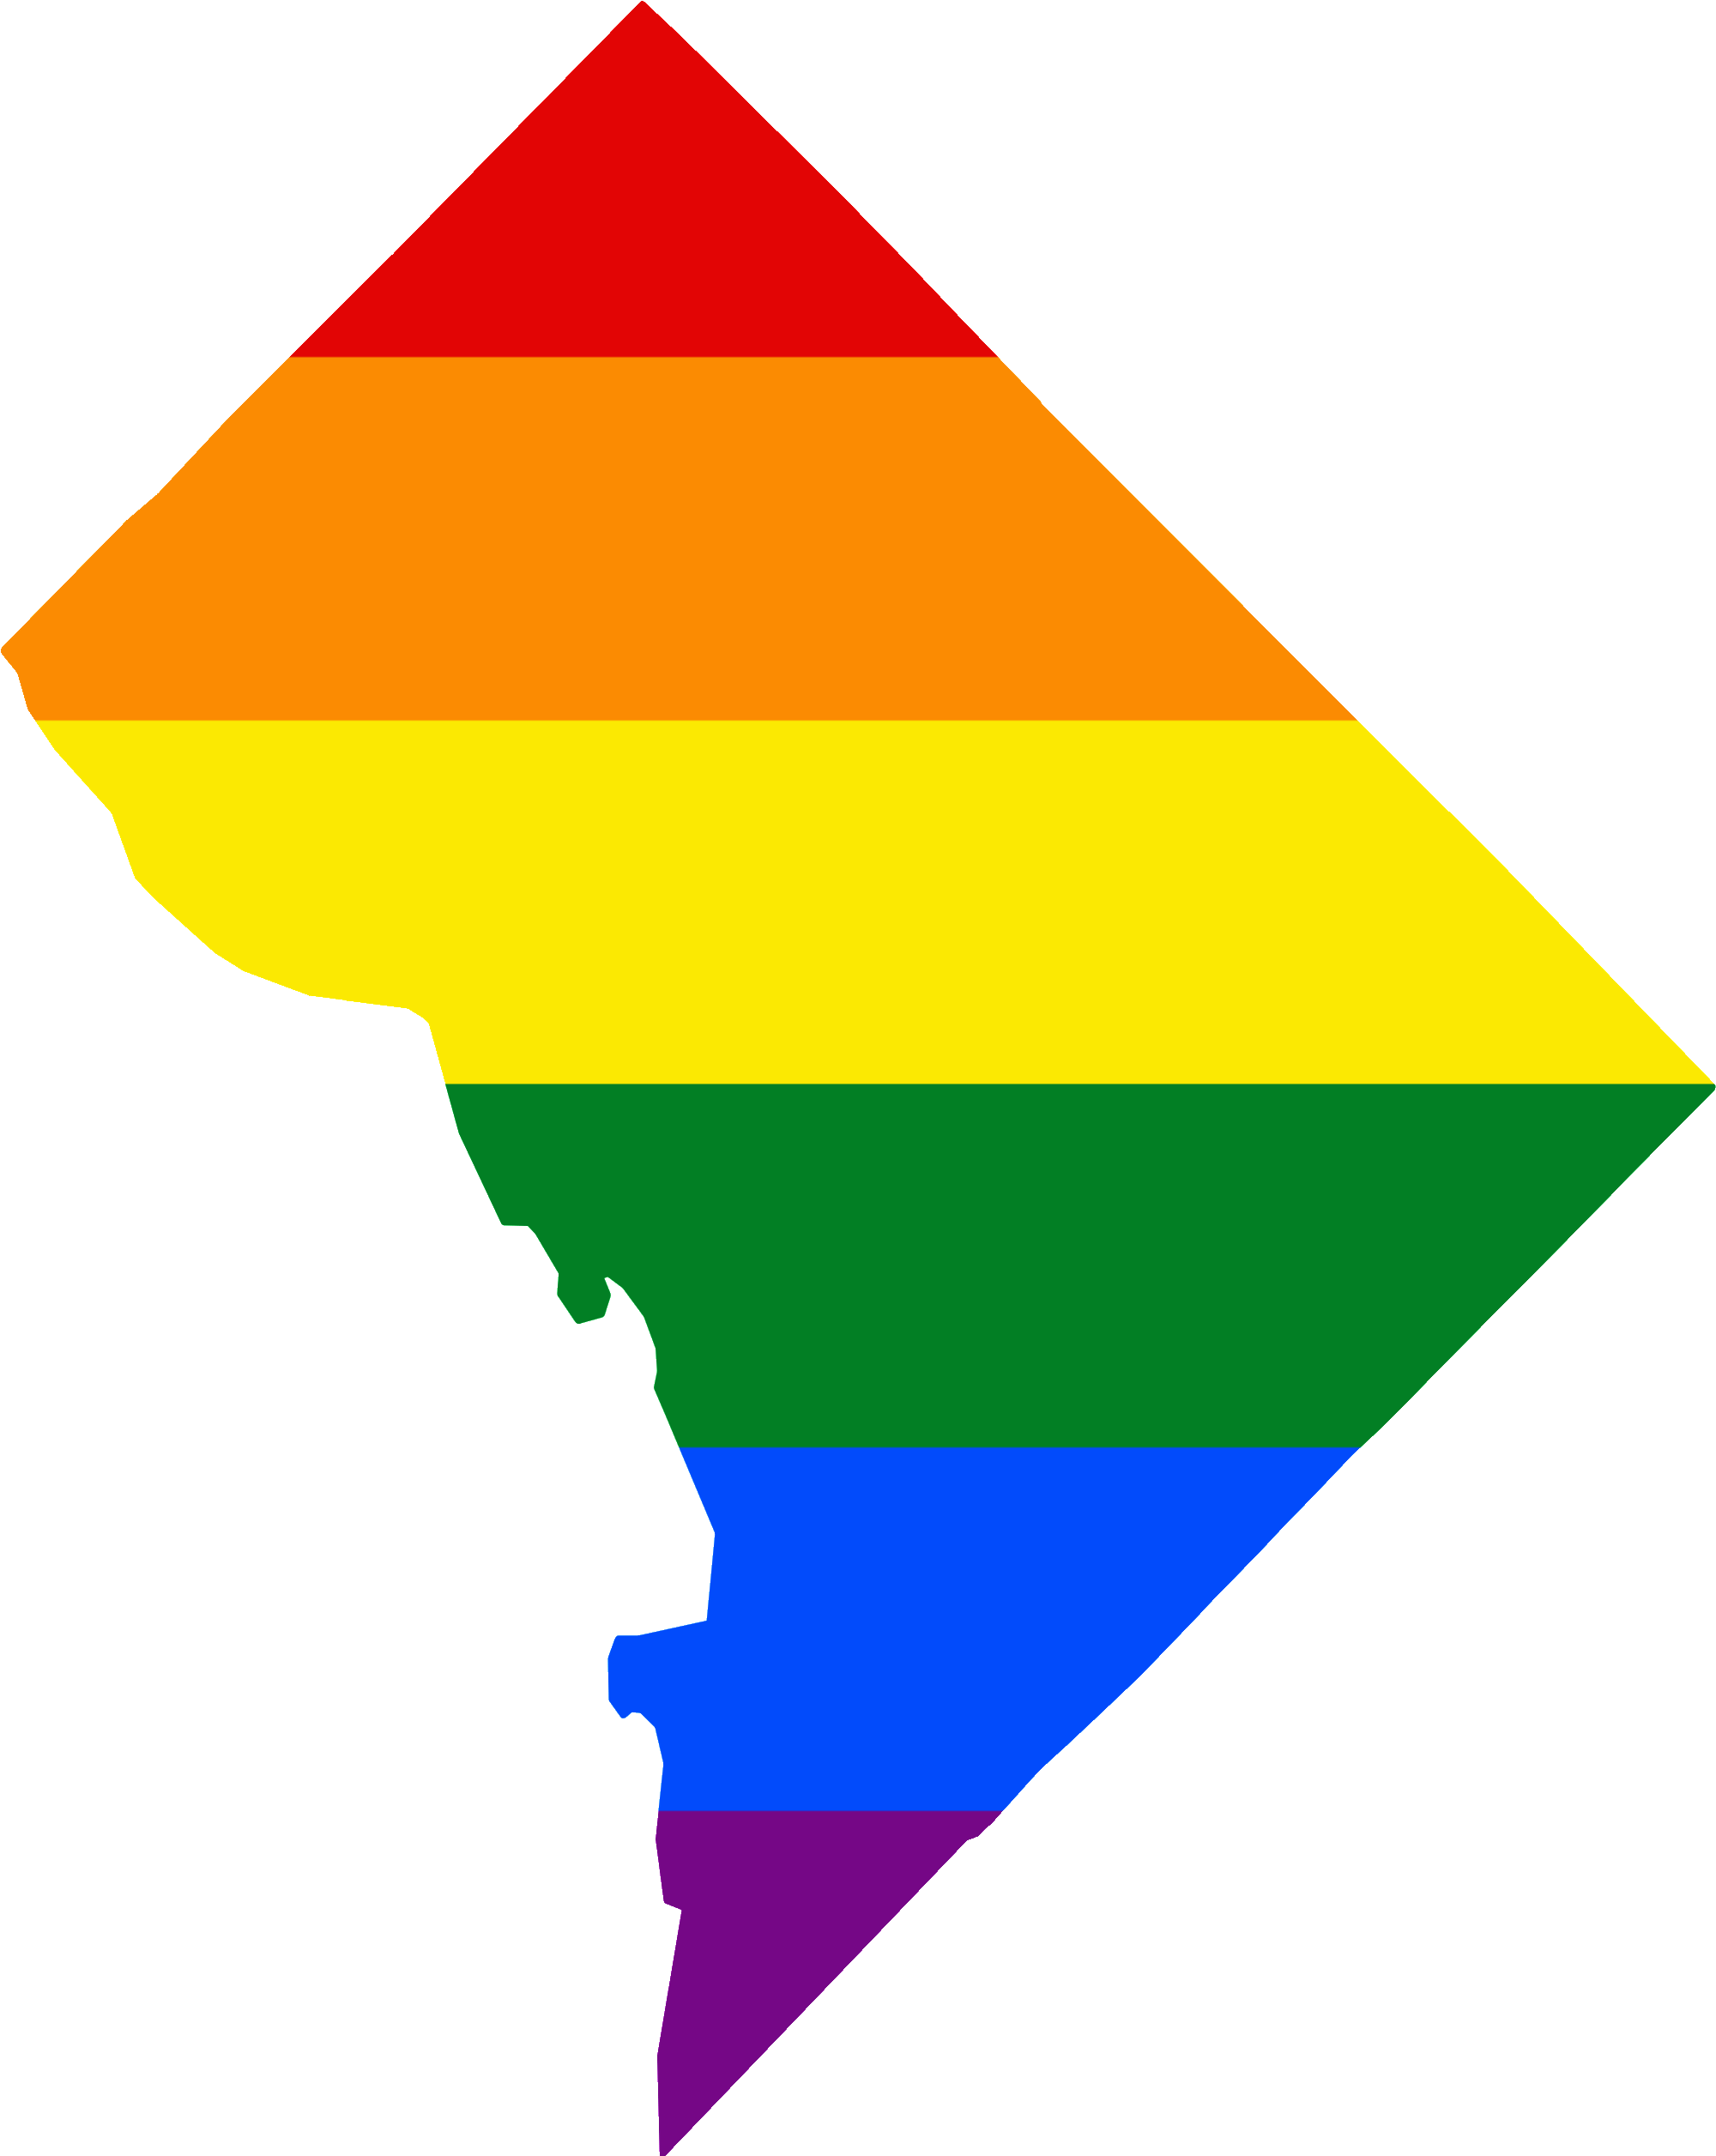 File:LGBT Flag map of Washington DC.png.